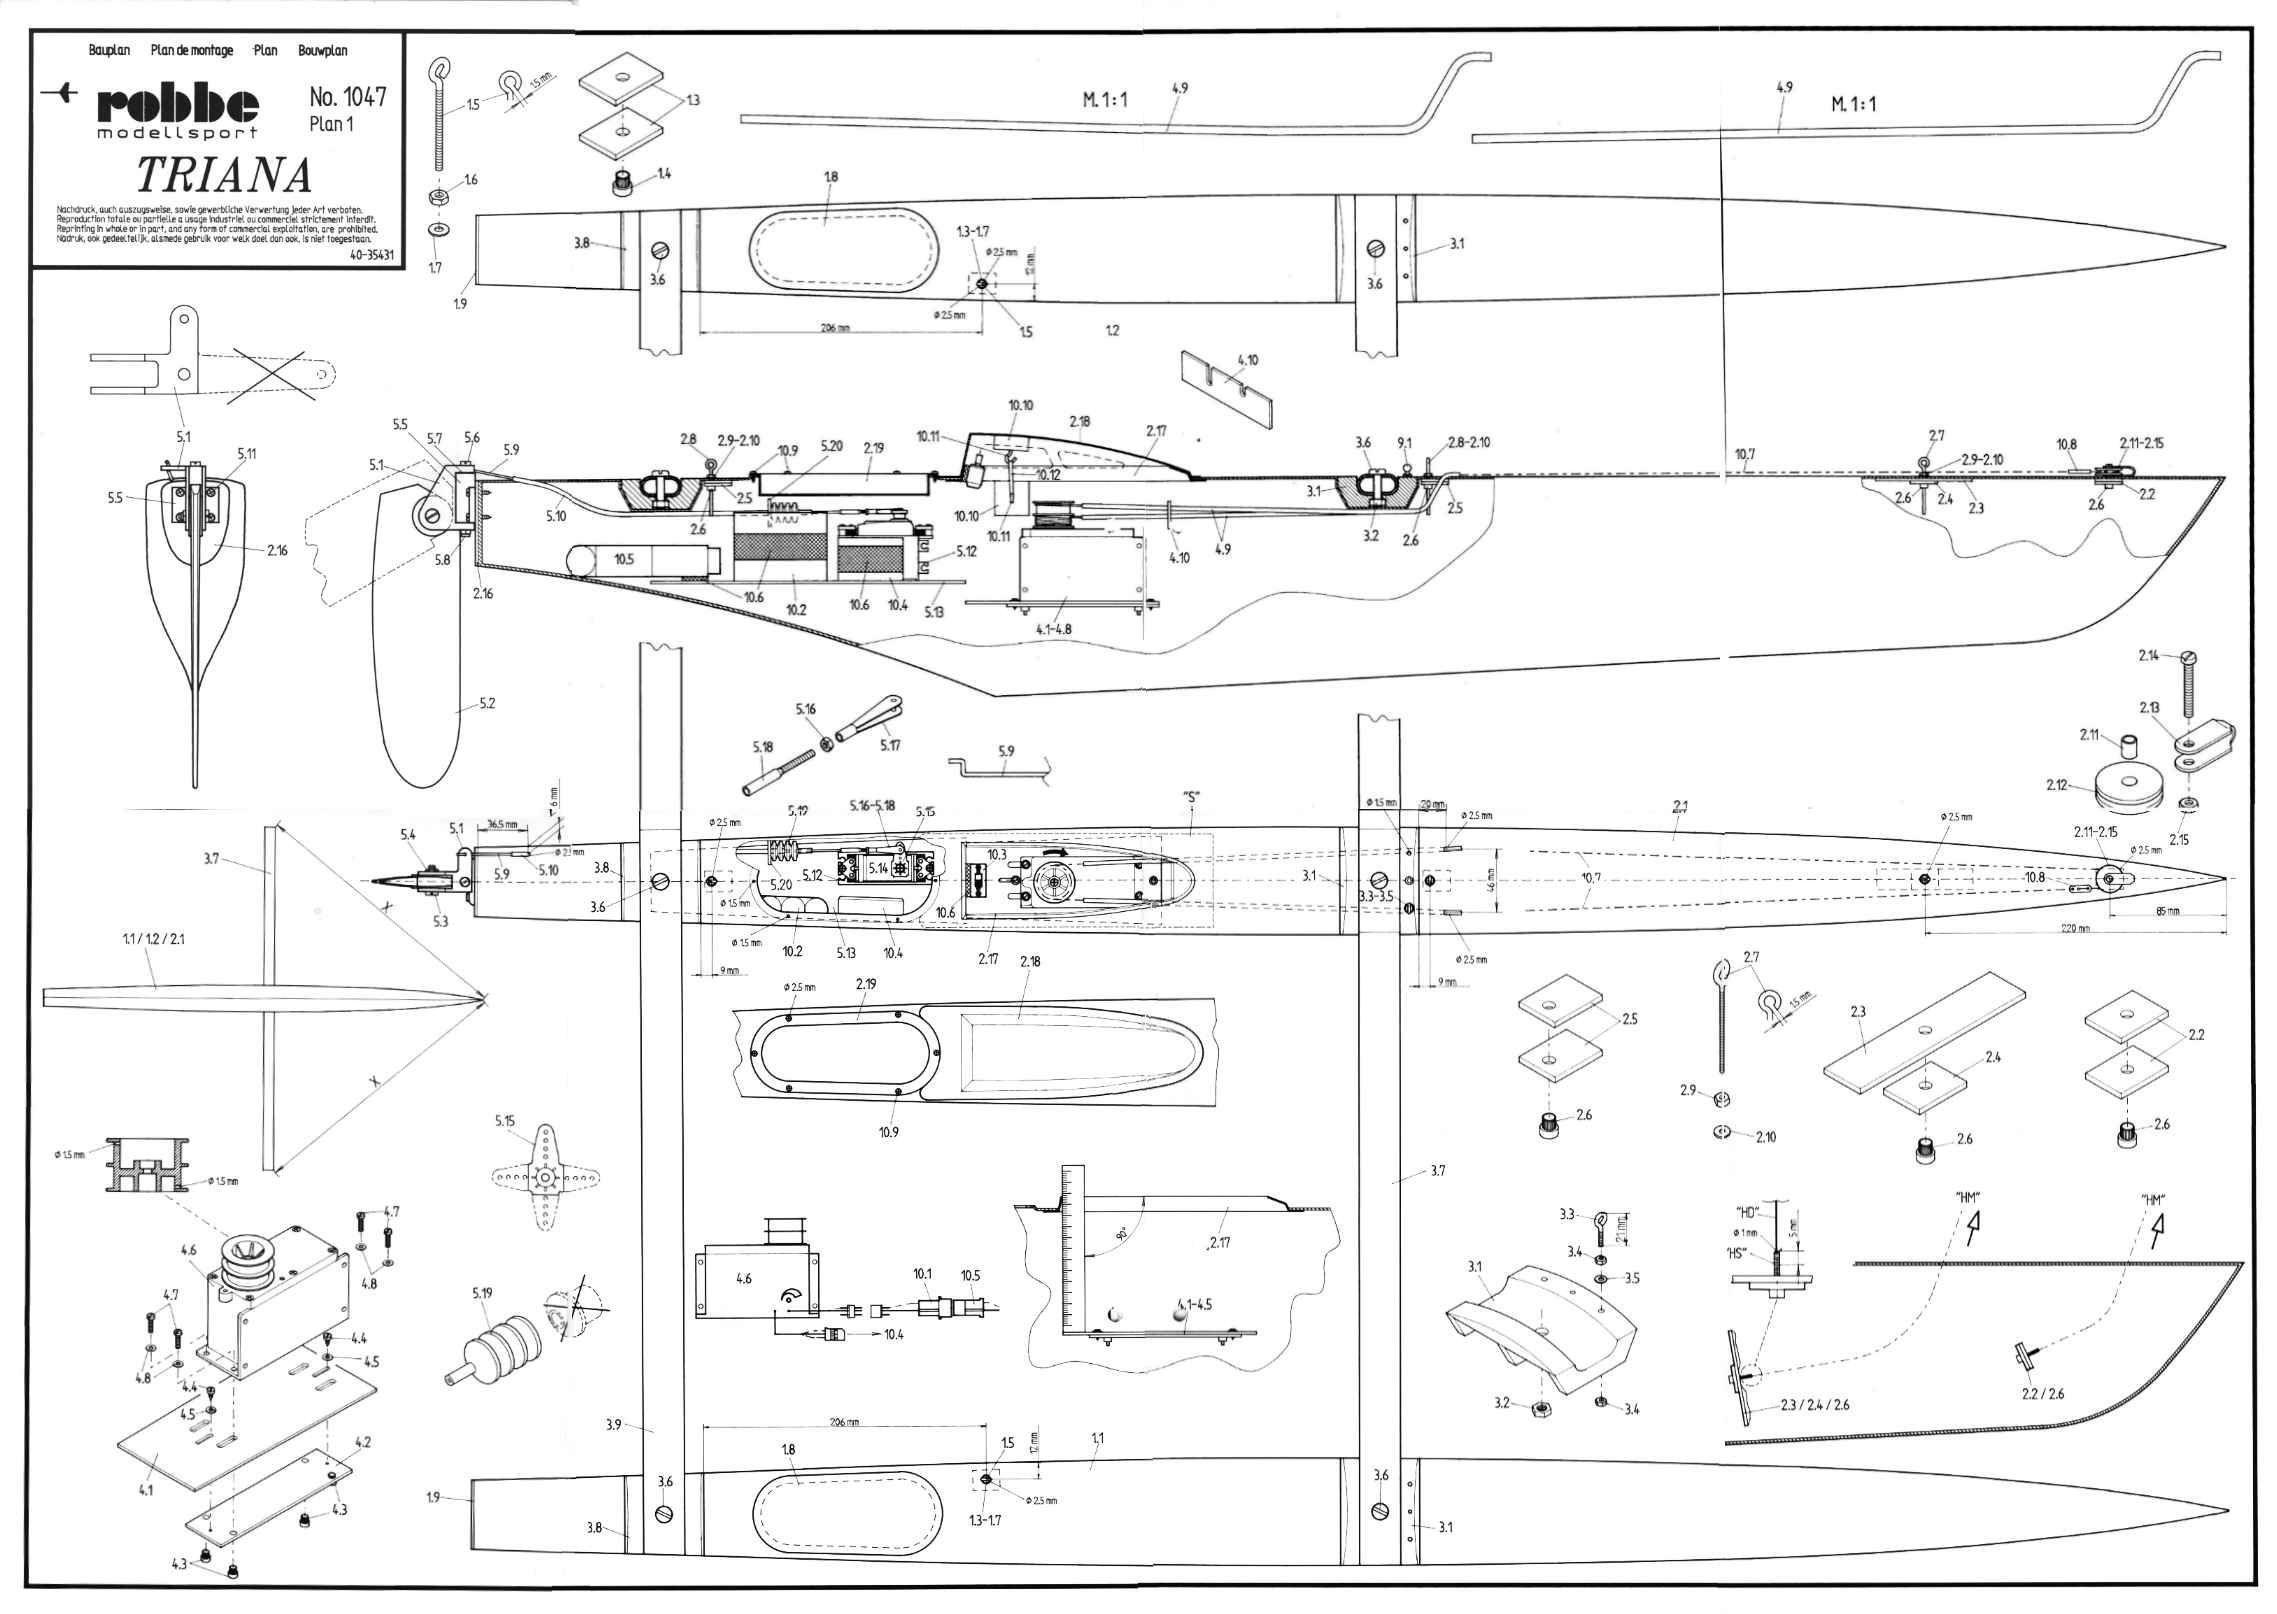 Power Catamaran RC Boat Building Plans